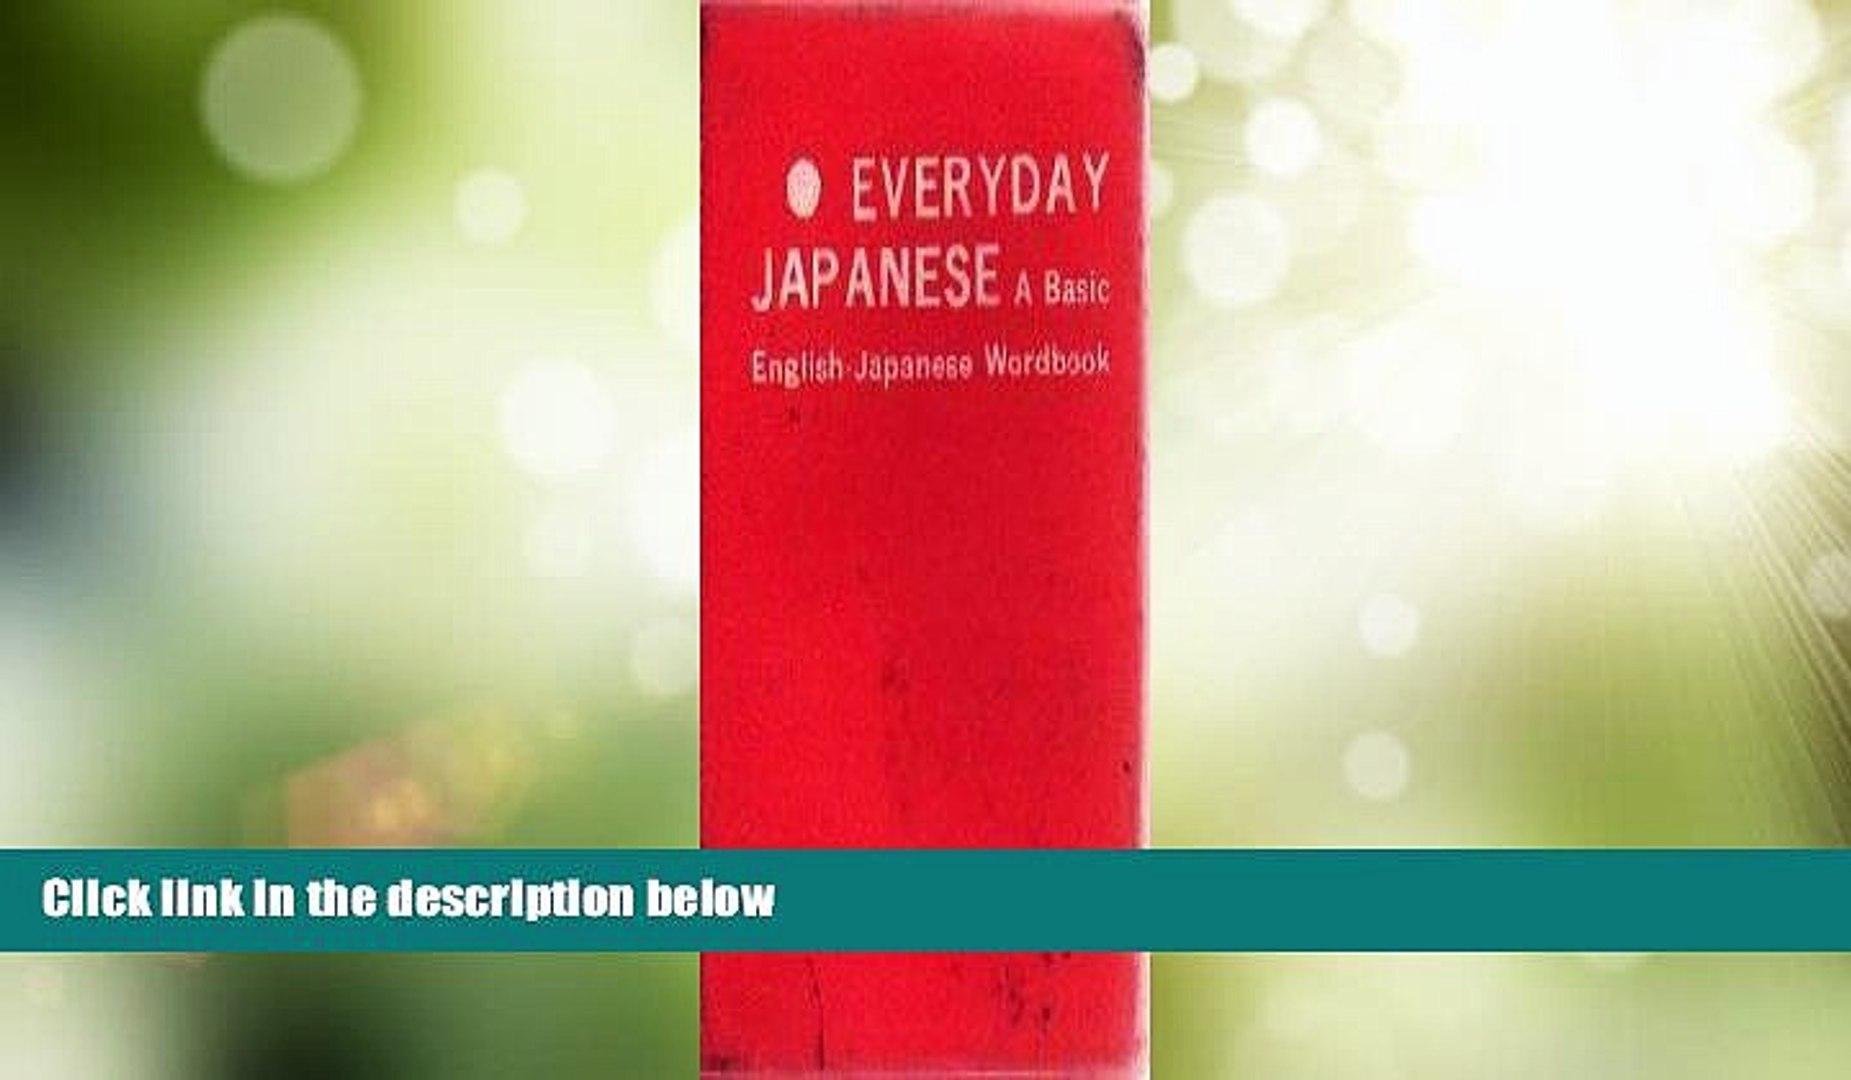 Must Have PDF  Everyday Japanese: A Basic English-Japanese Wordbook  Full Read Best Seller